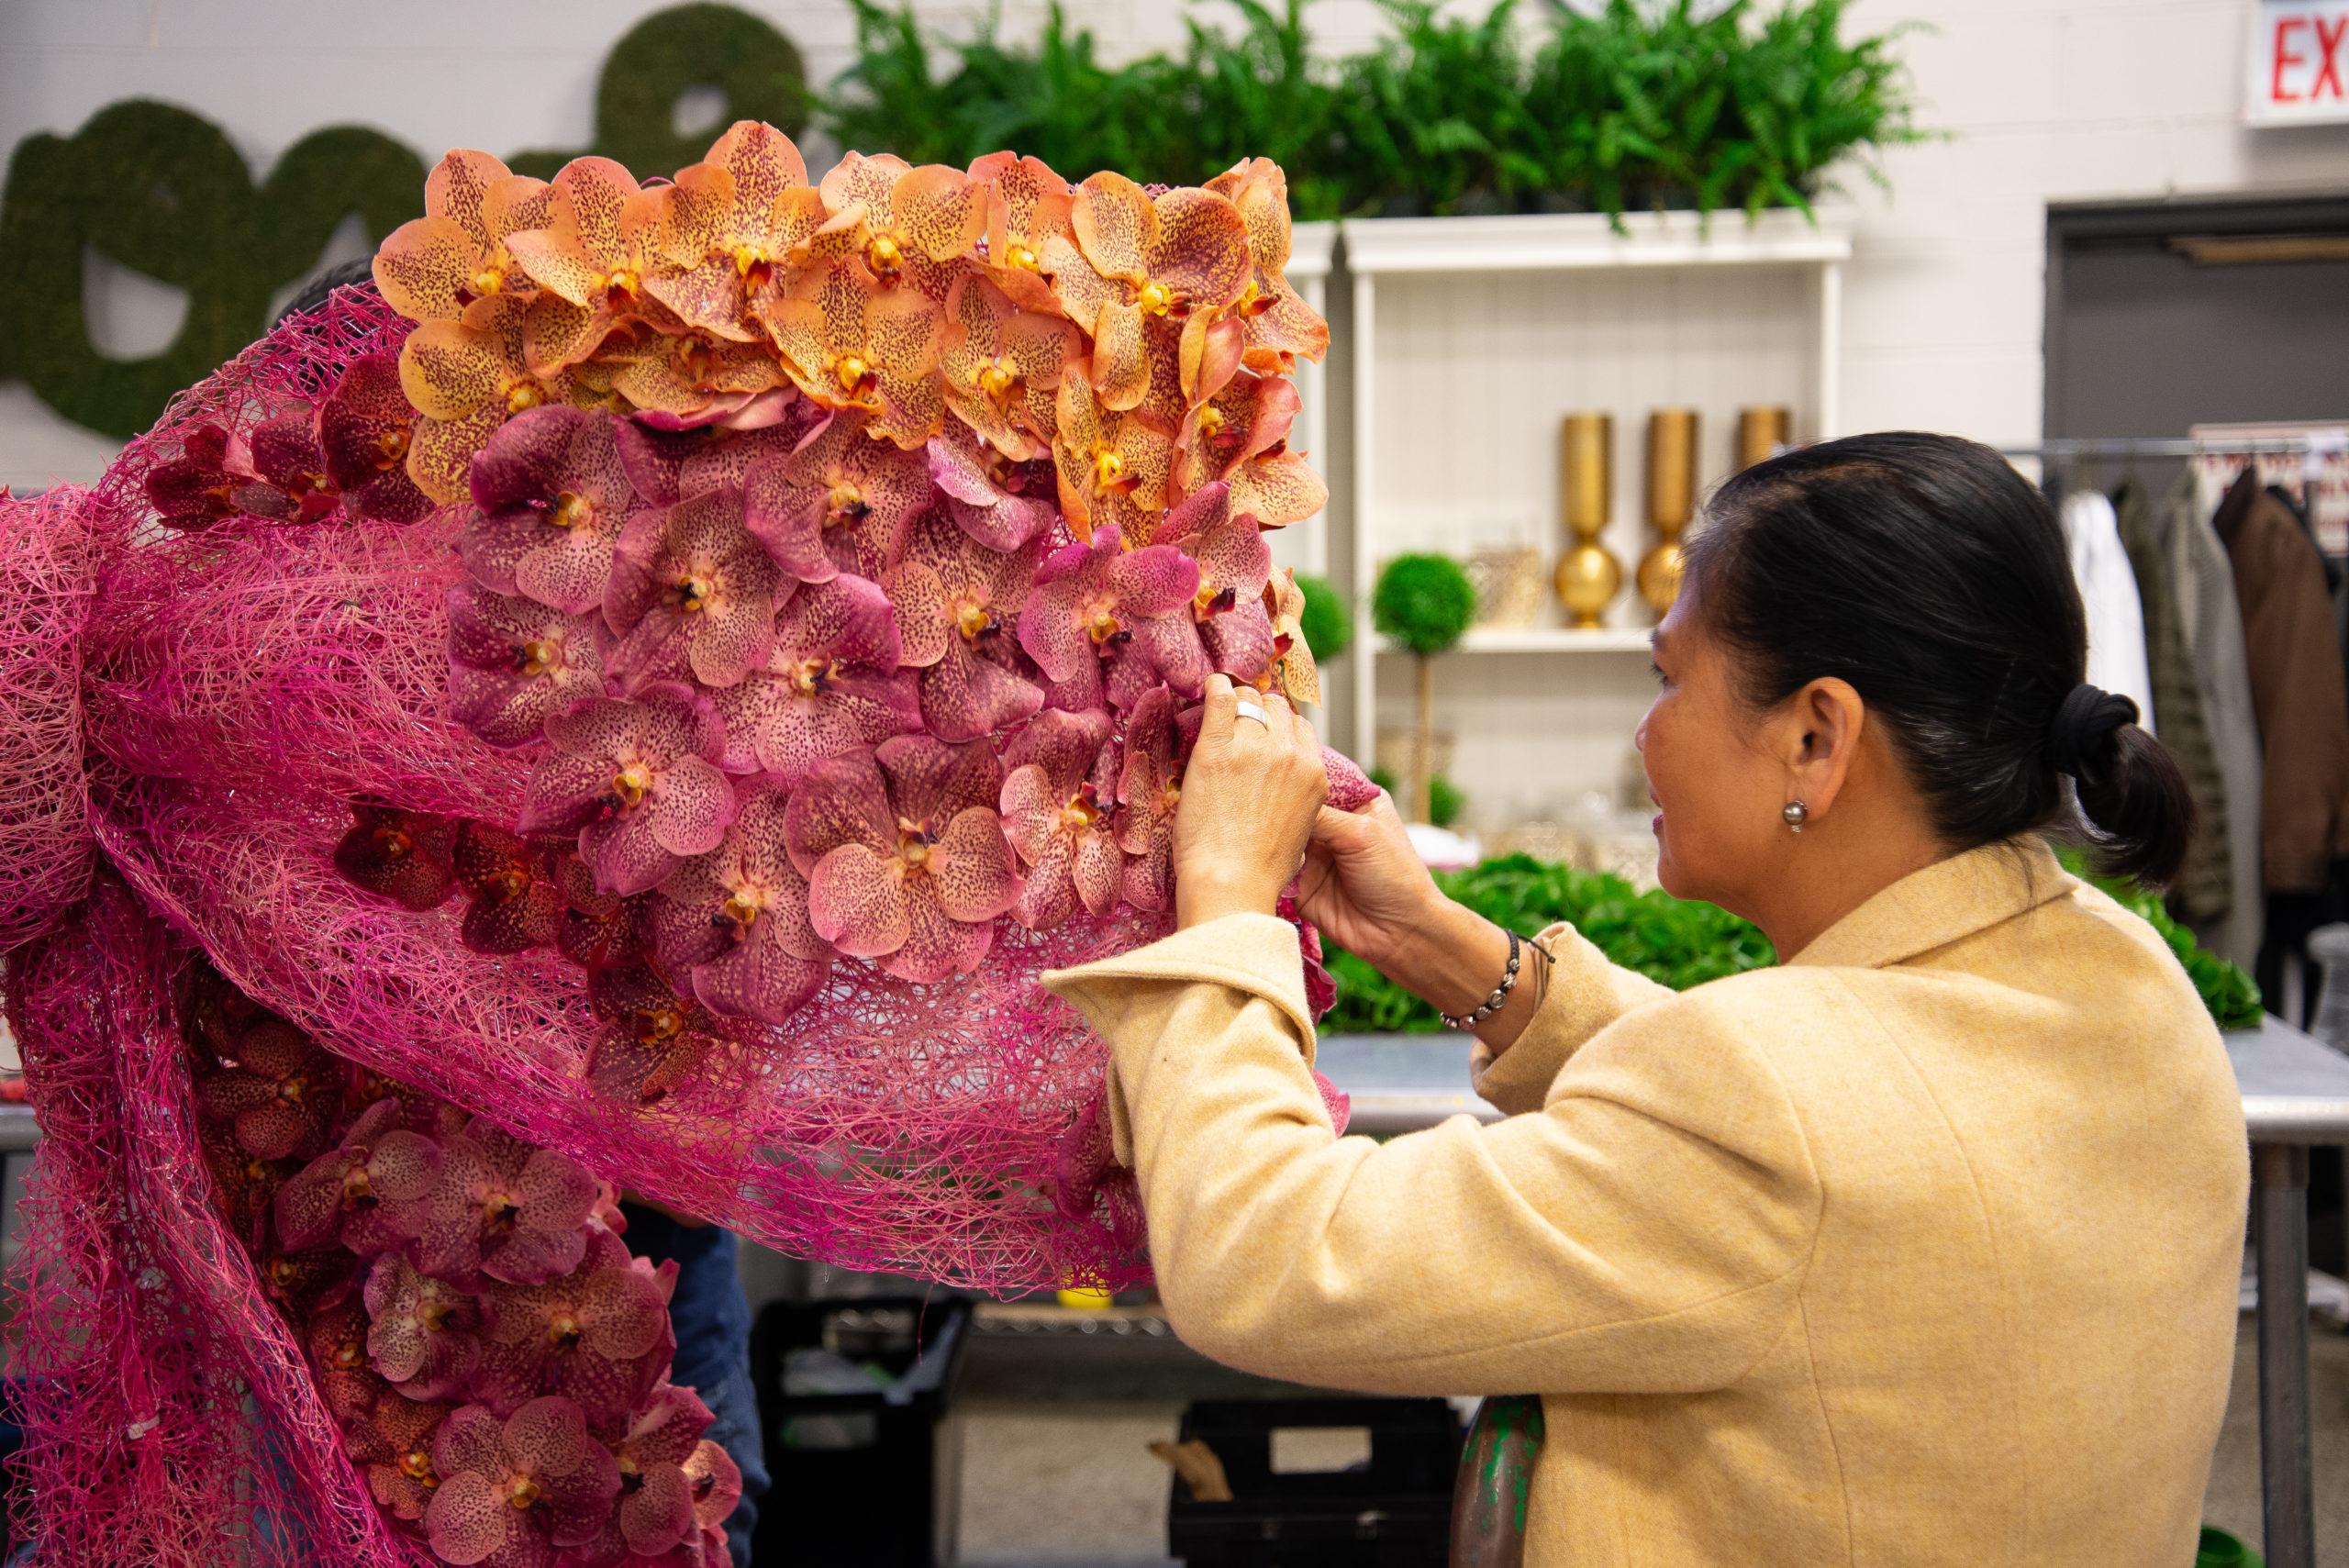 Fleurs De Villes: Behind the Scenes